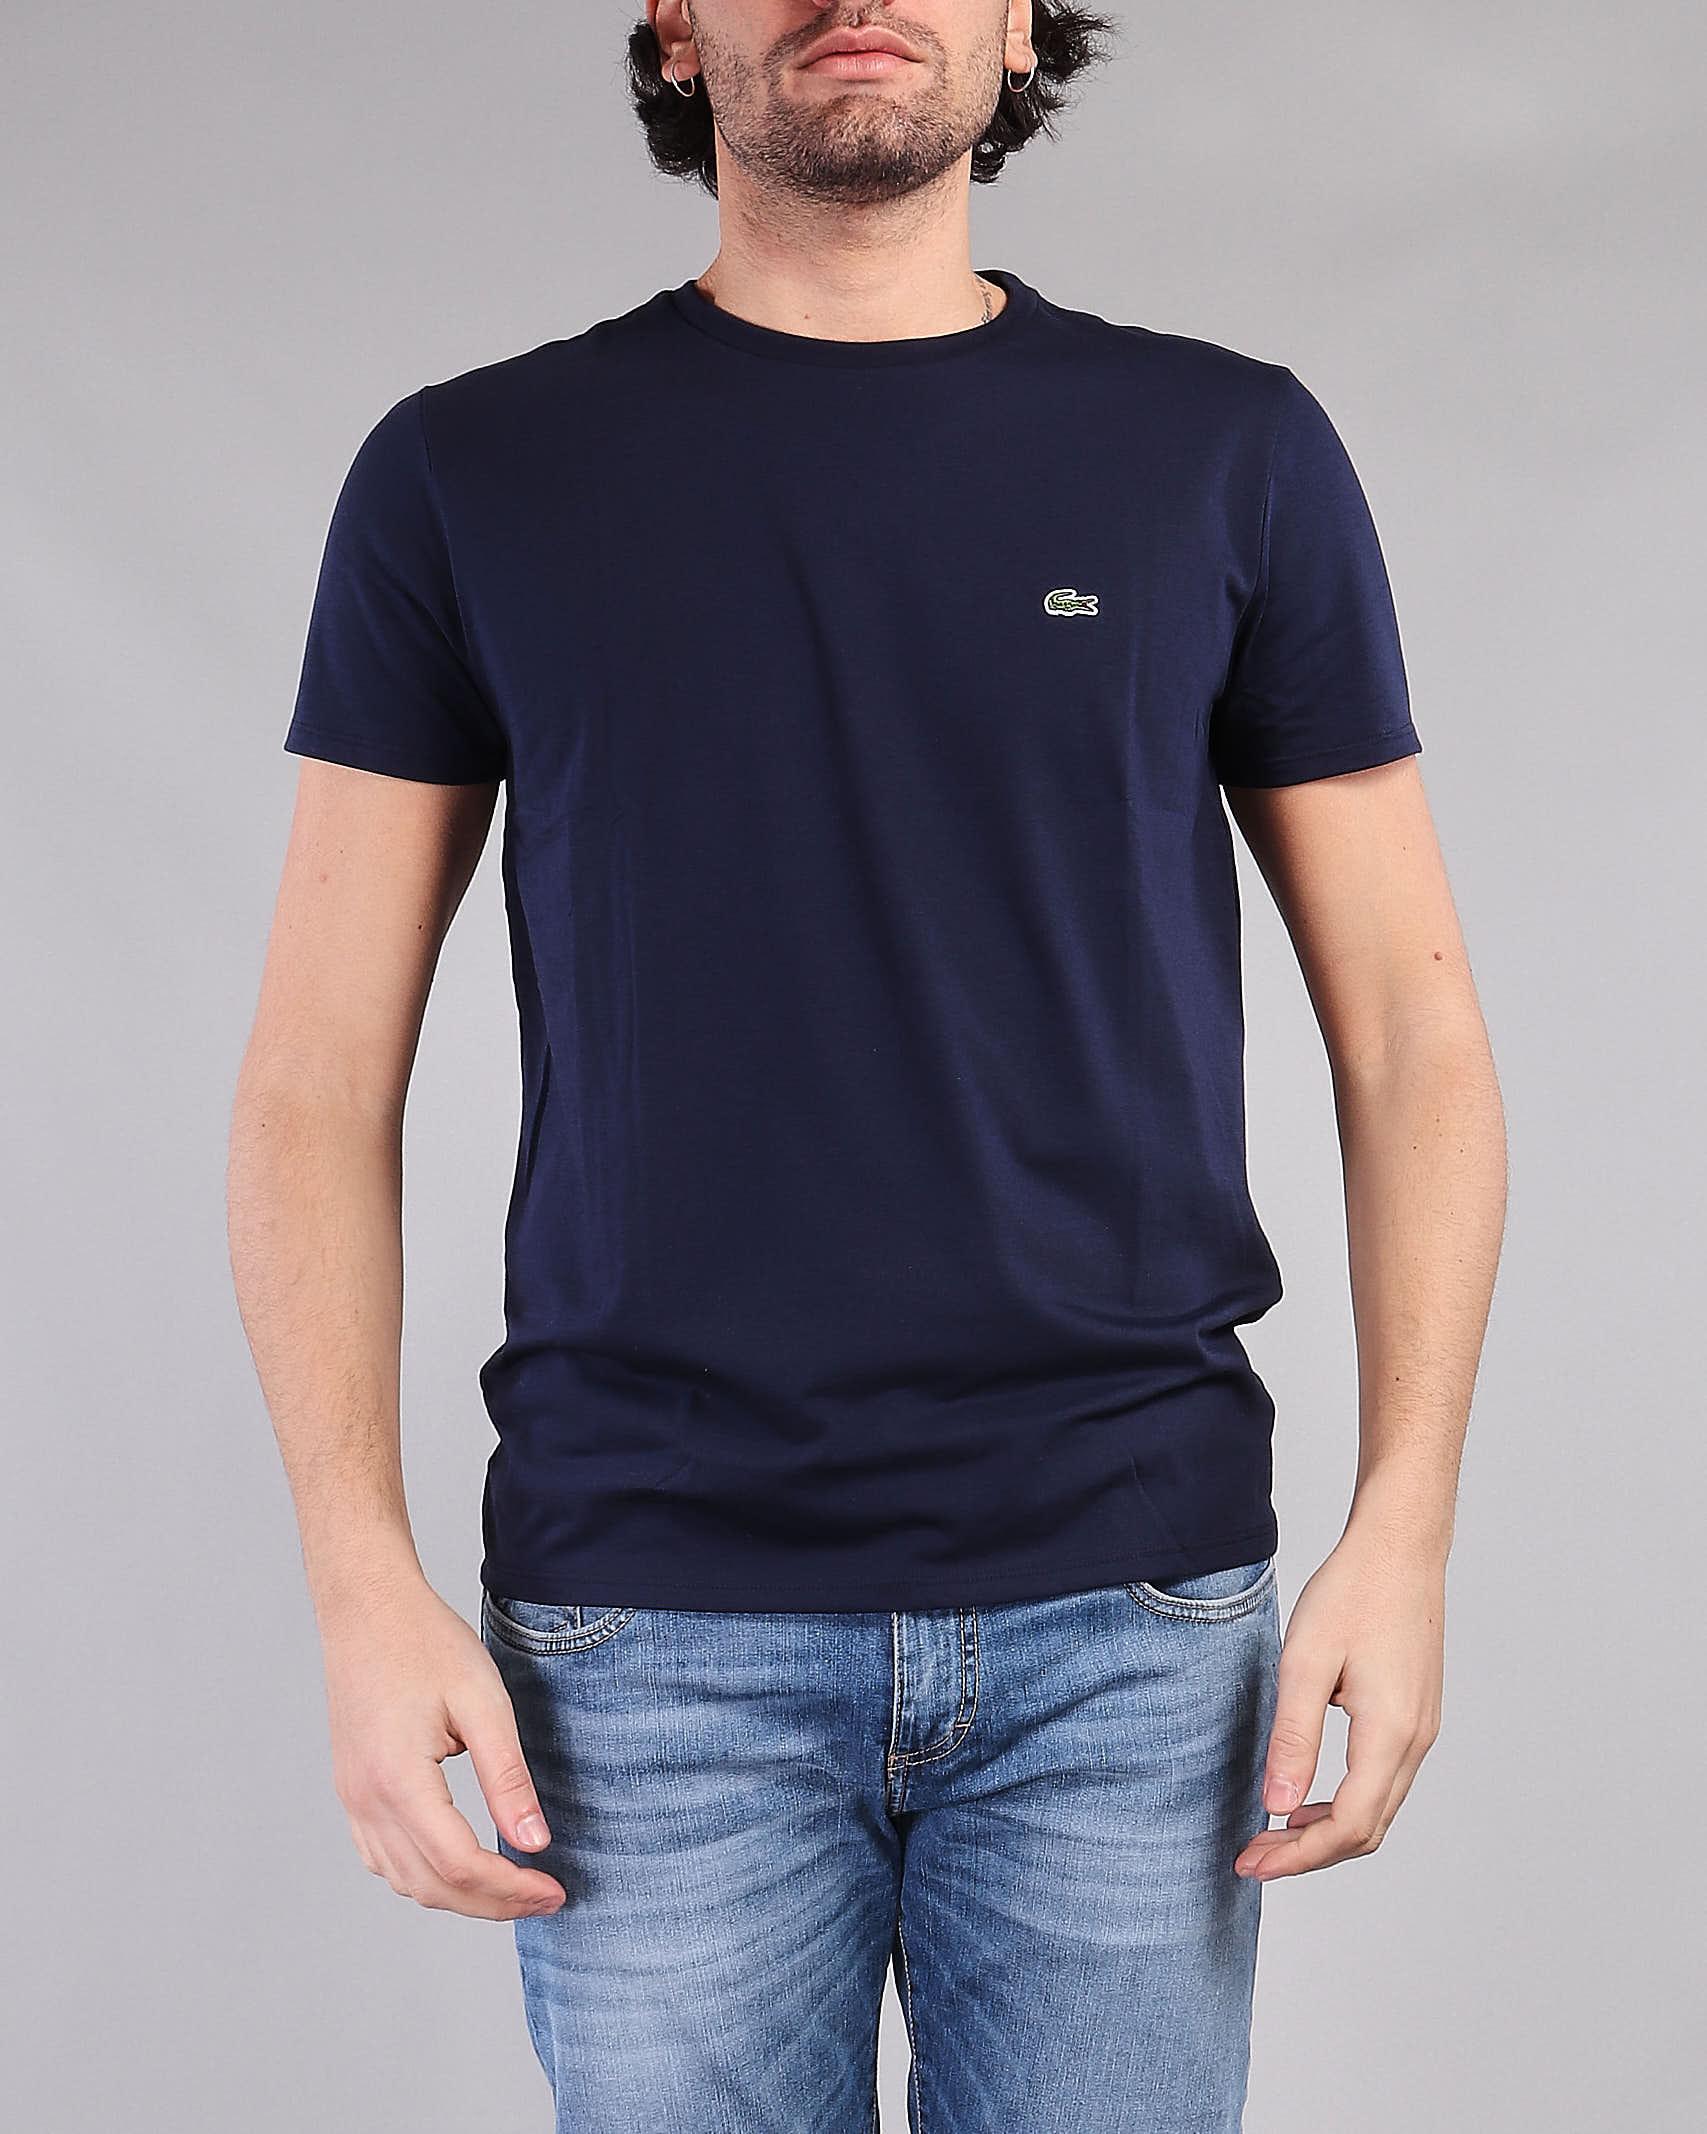 T-shirt in jersey di cotone Pima Lacoste LACOSTE | T-shirt | TH6709166